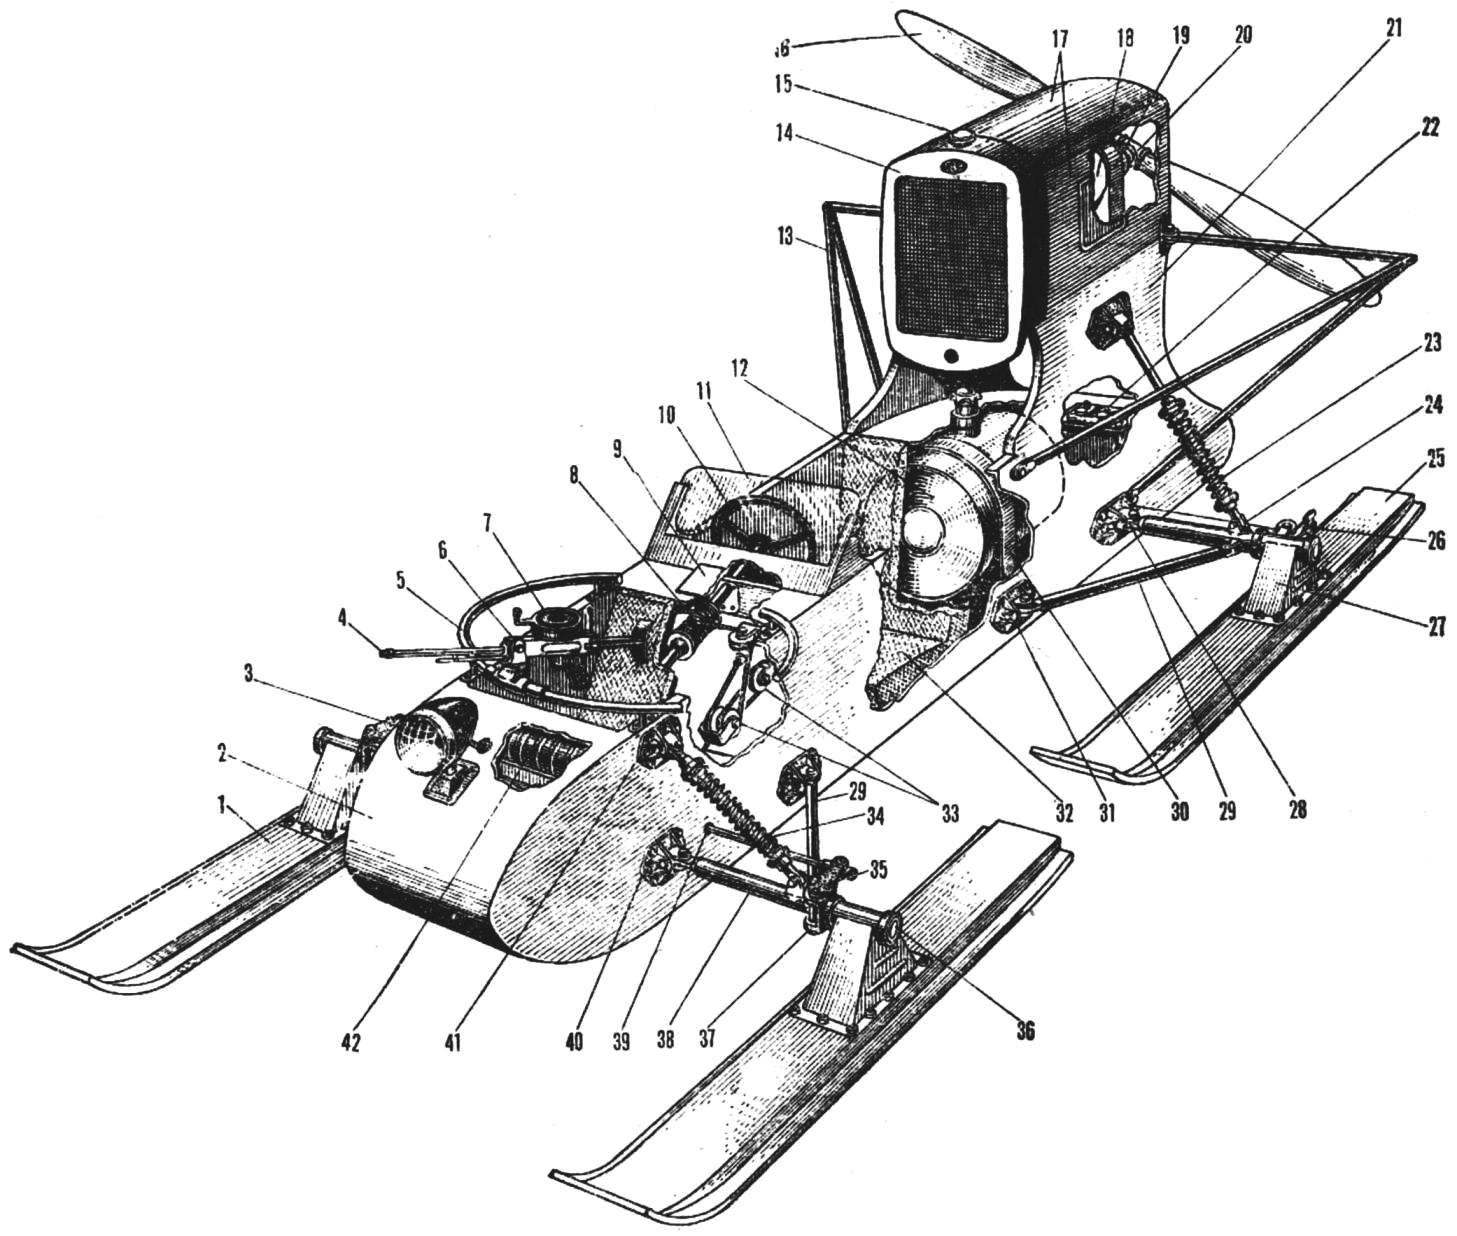 Рис. 2. Компоновка аэросаней РФ-8-ГАЗ-98